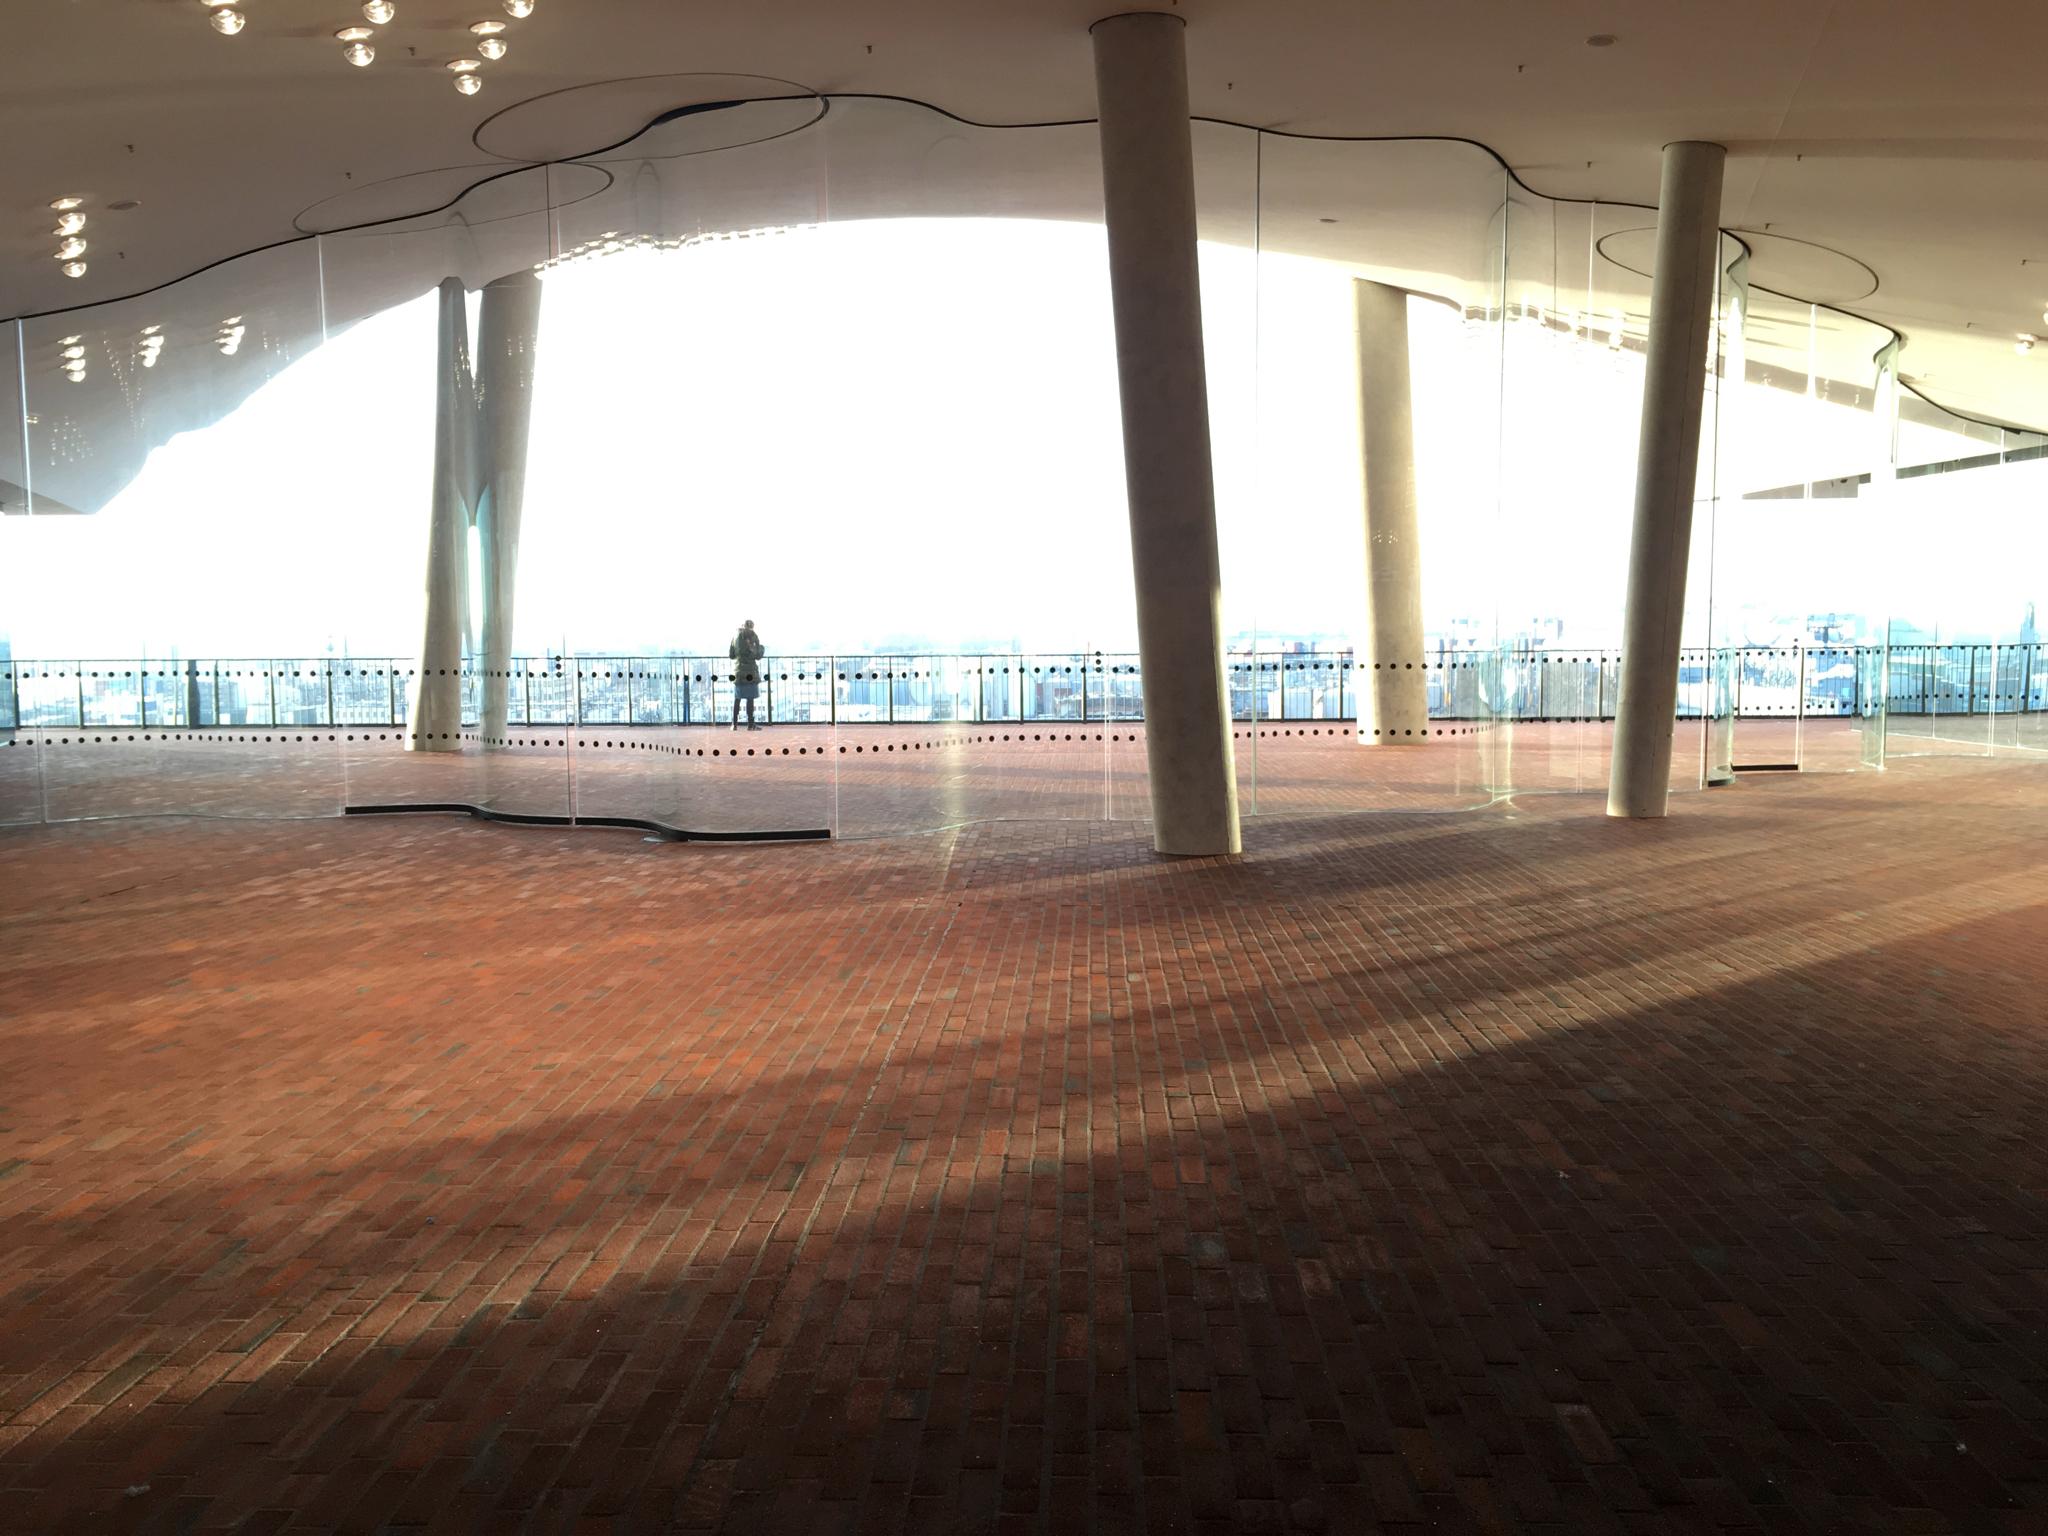 Elbphilharmonie Hamburg BeFifty Reiseblog